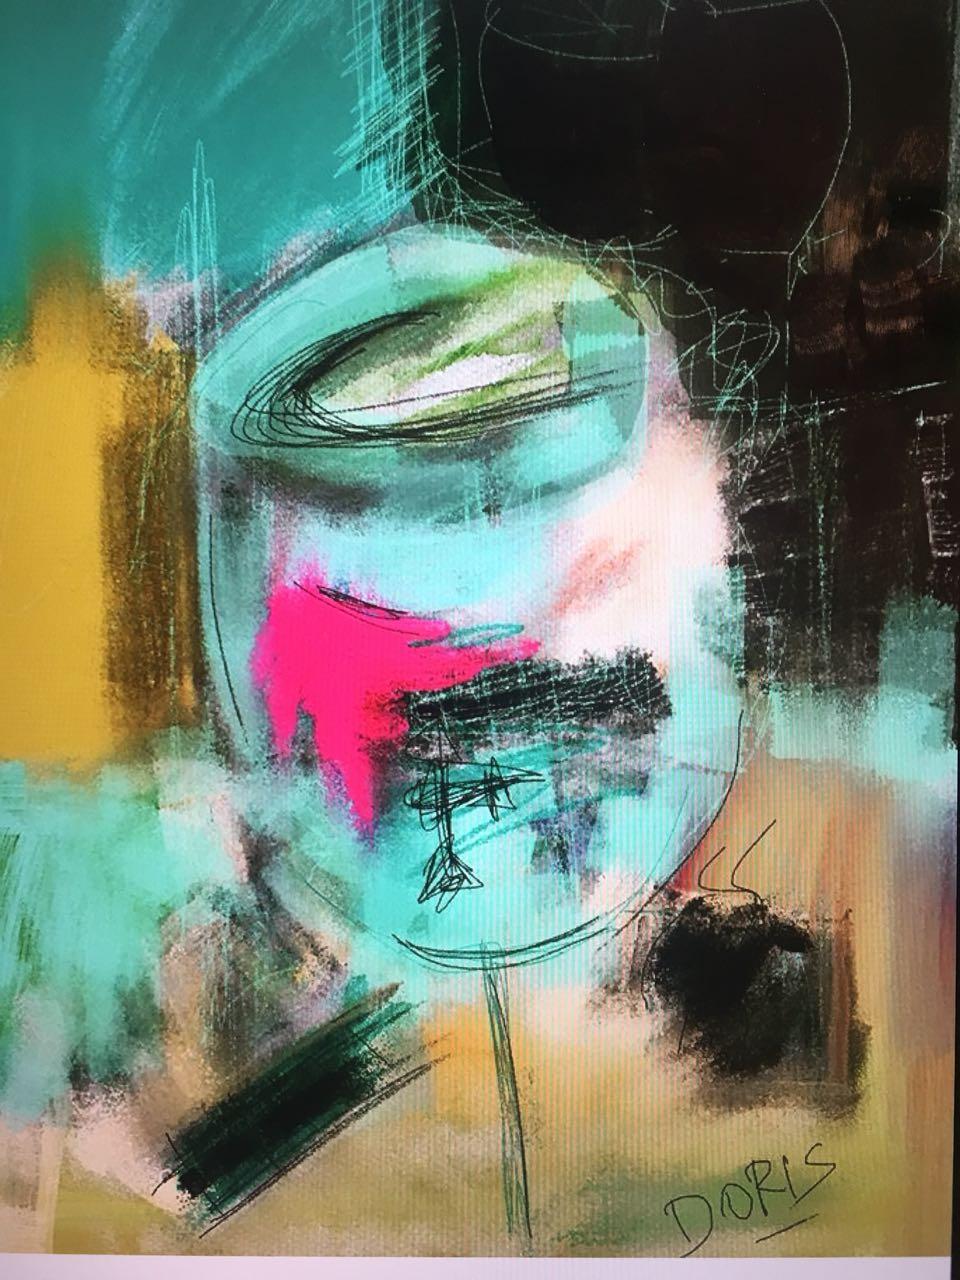 Taça, 2018 | Arte digital | 50 x 40 cm | R$ 500